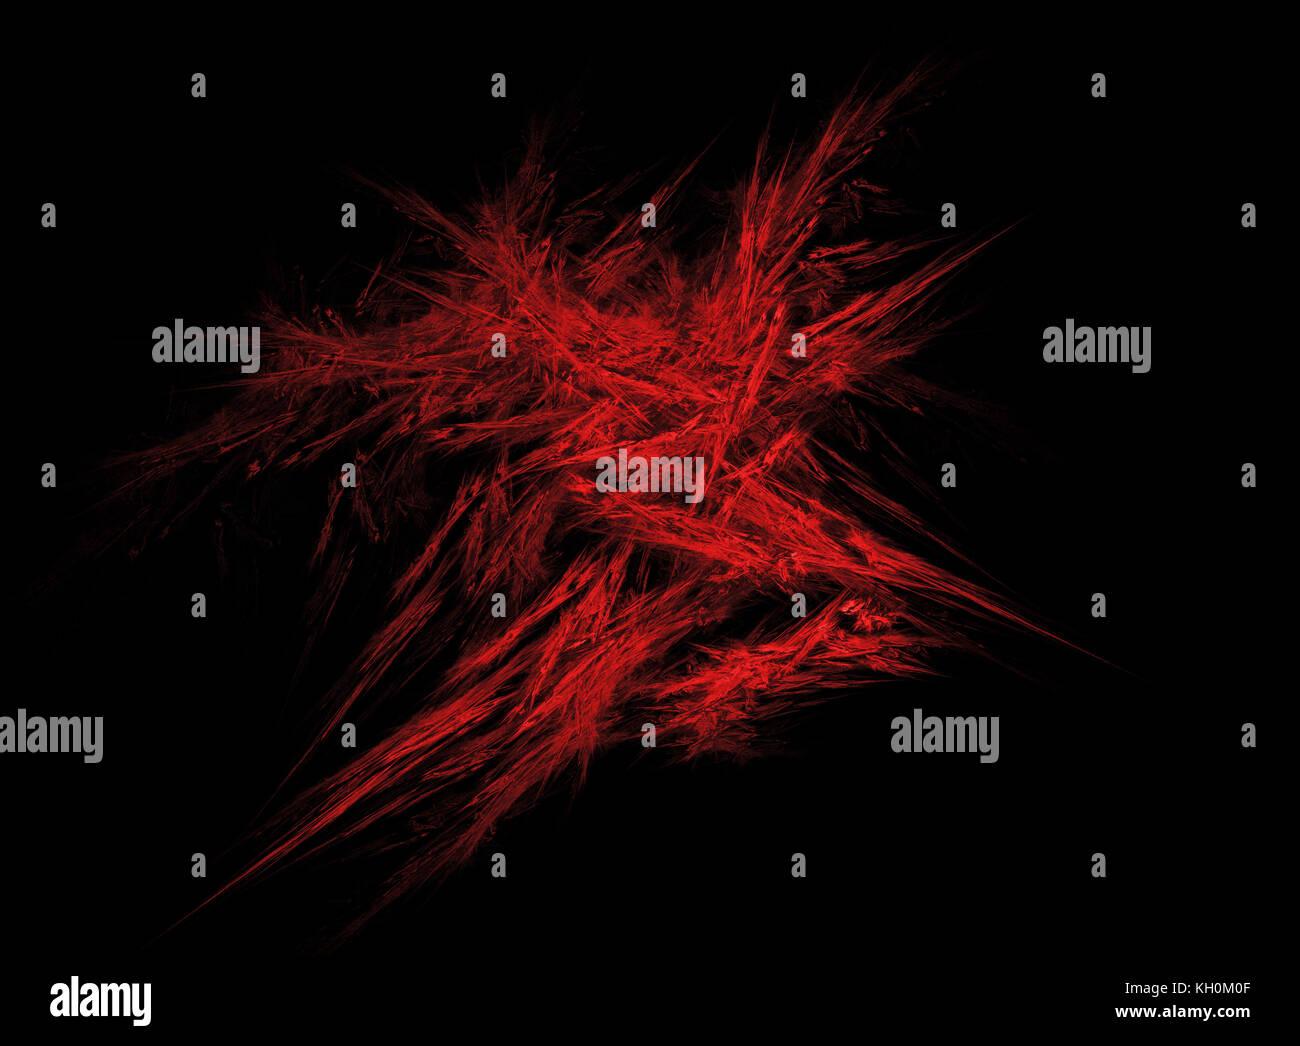 Red energy explosion. Fractal art. - Stock Image